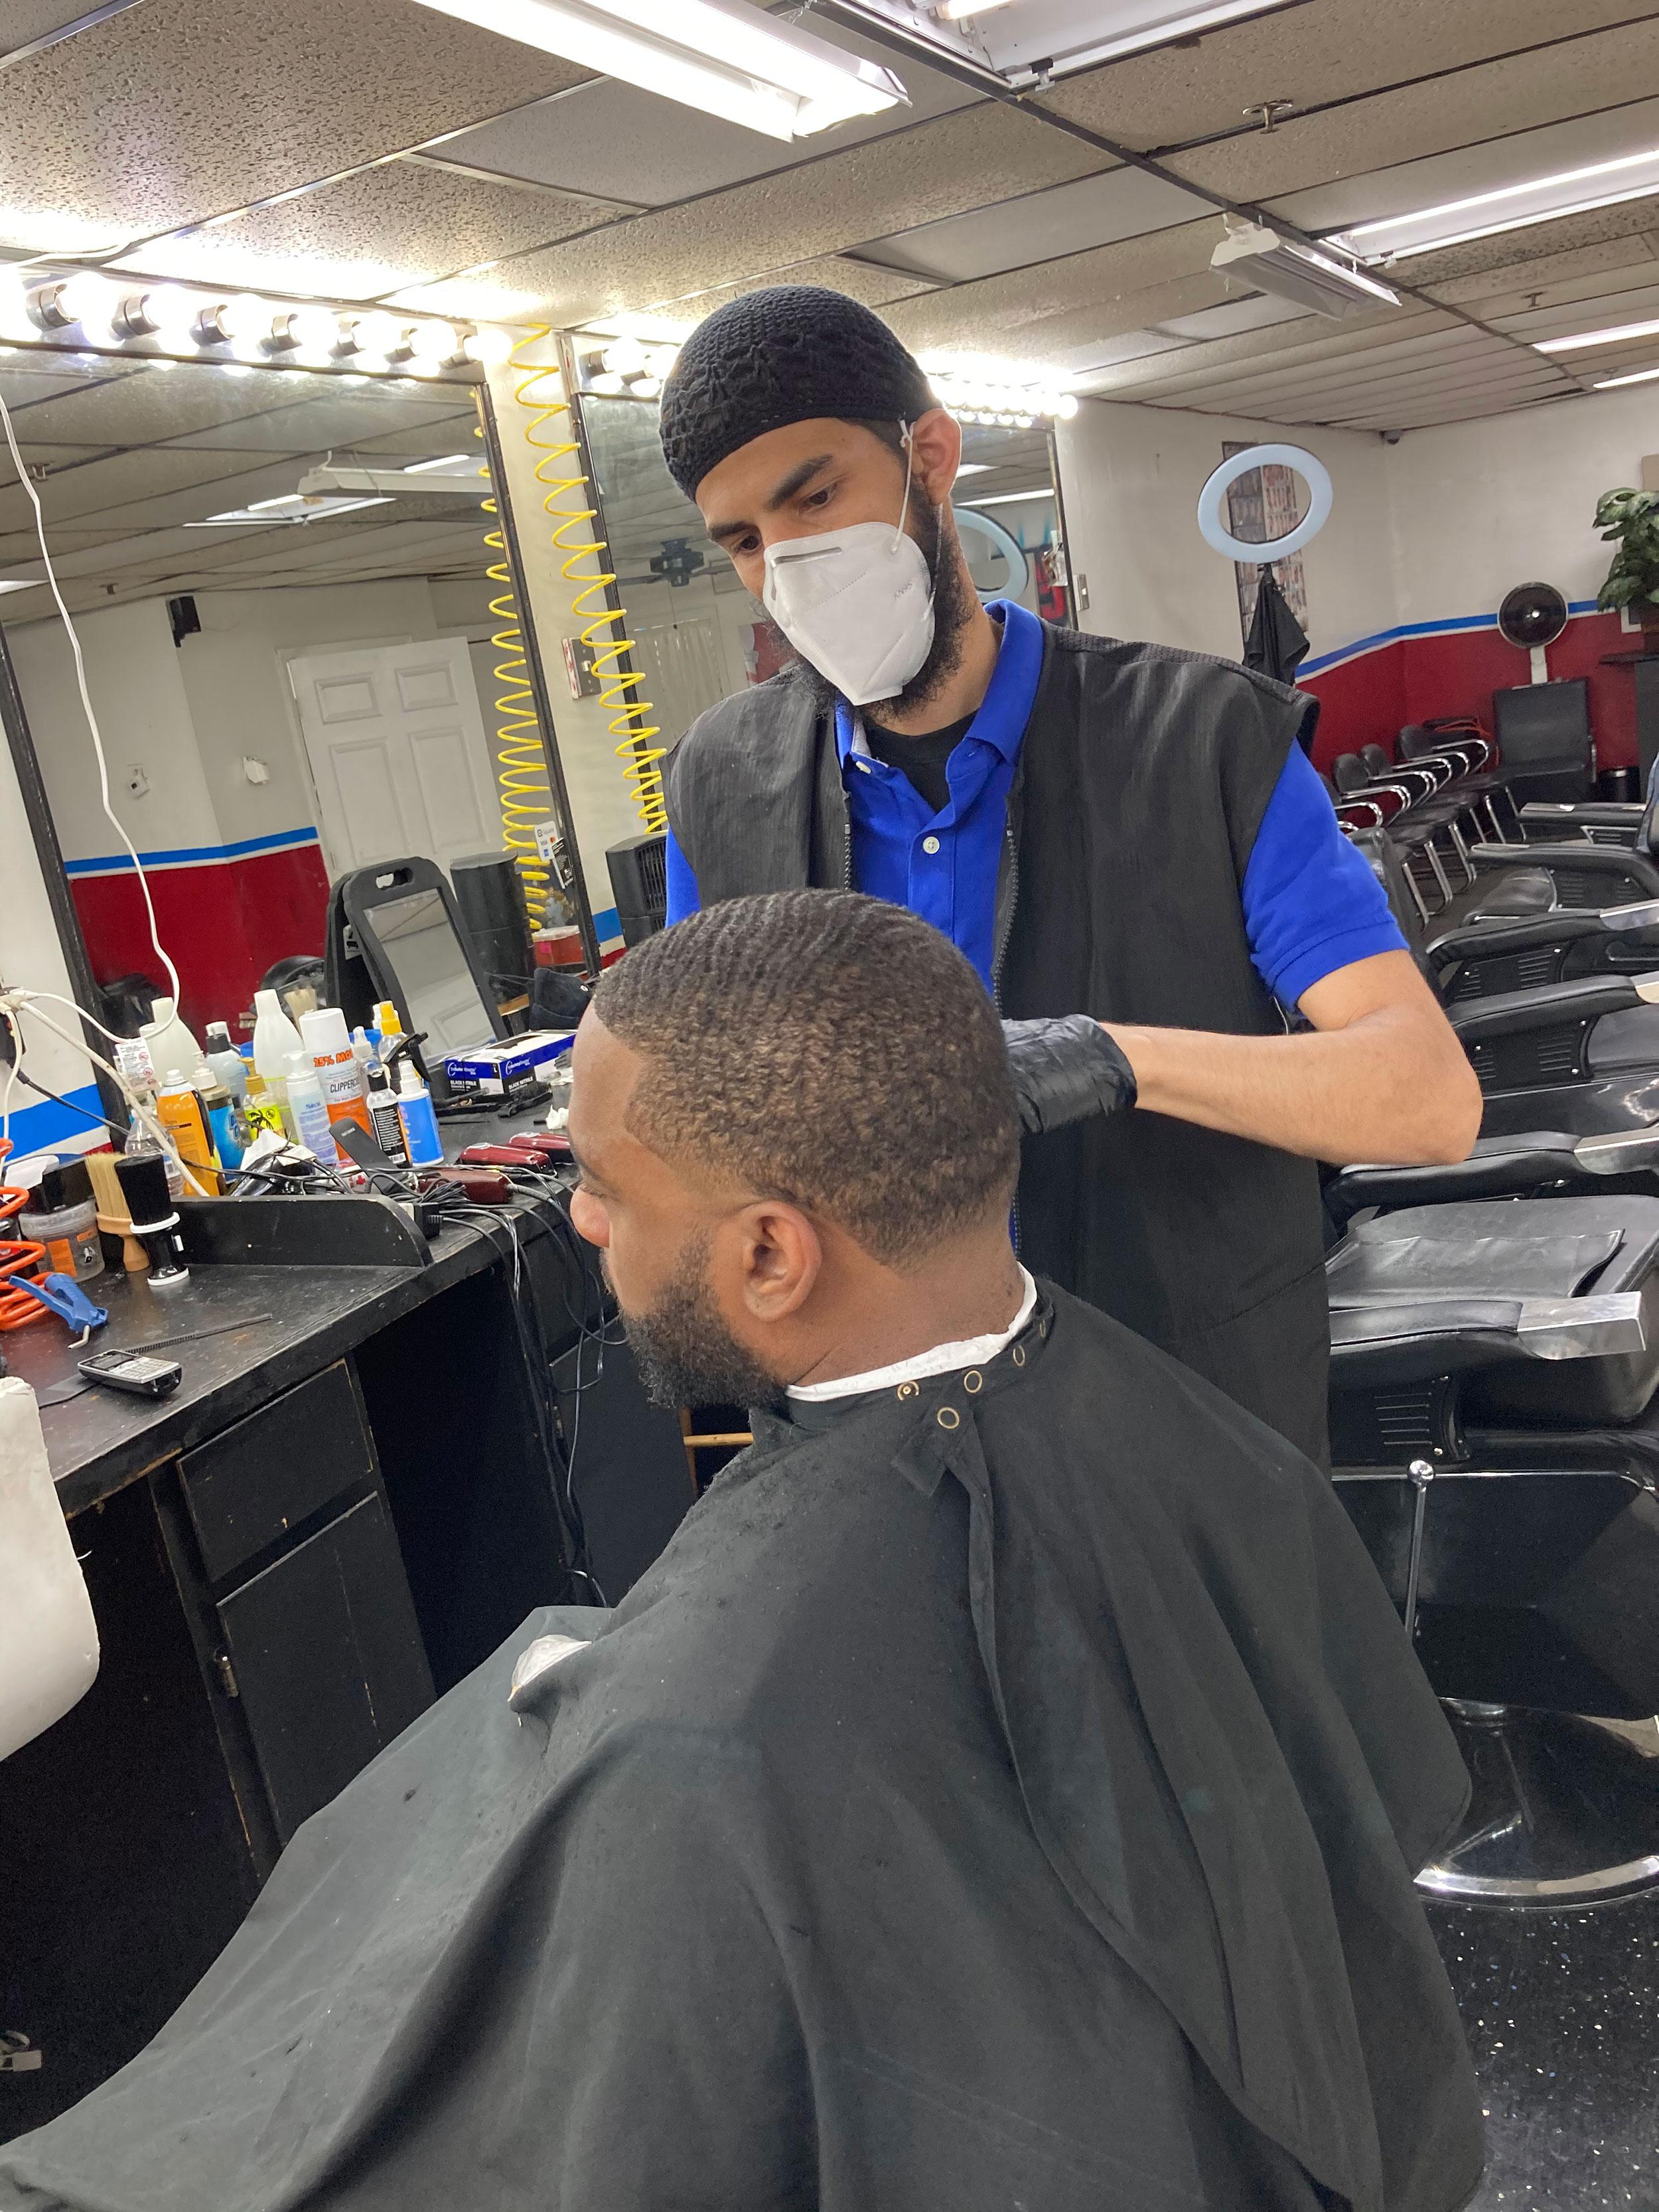 How coronavirus is transforming hair salons and barbershops - CNN